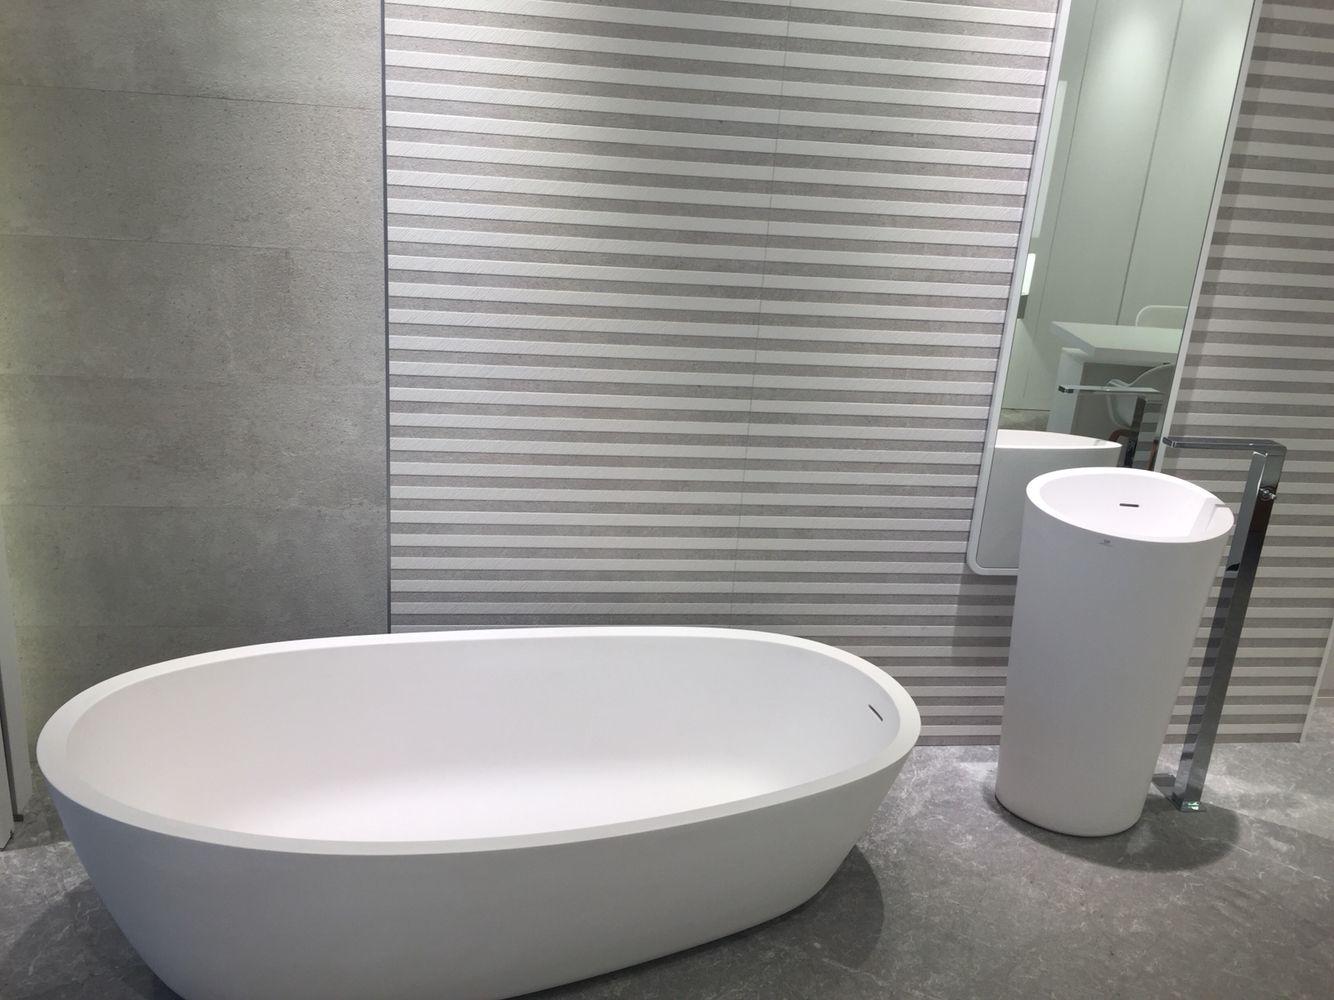 Porcelanosa badkamer | Venis en porcelanosa tegels | Pinterest